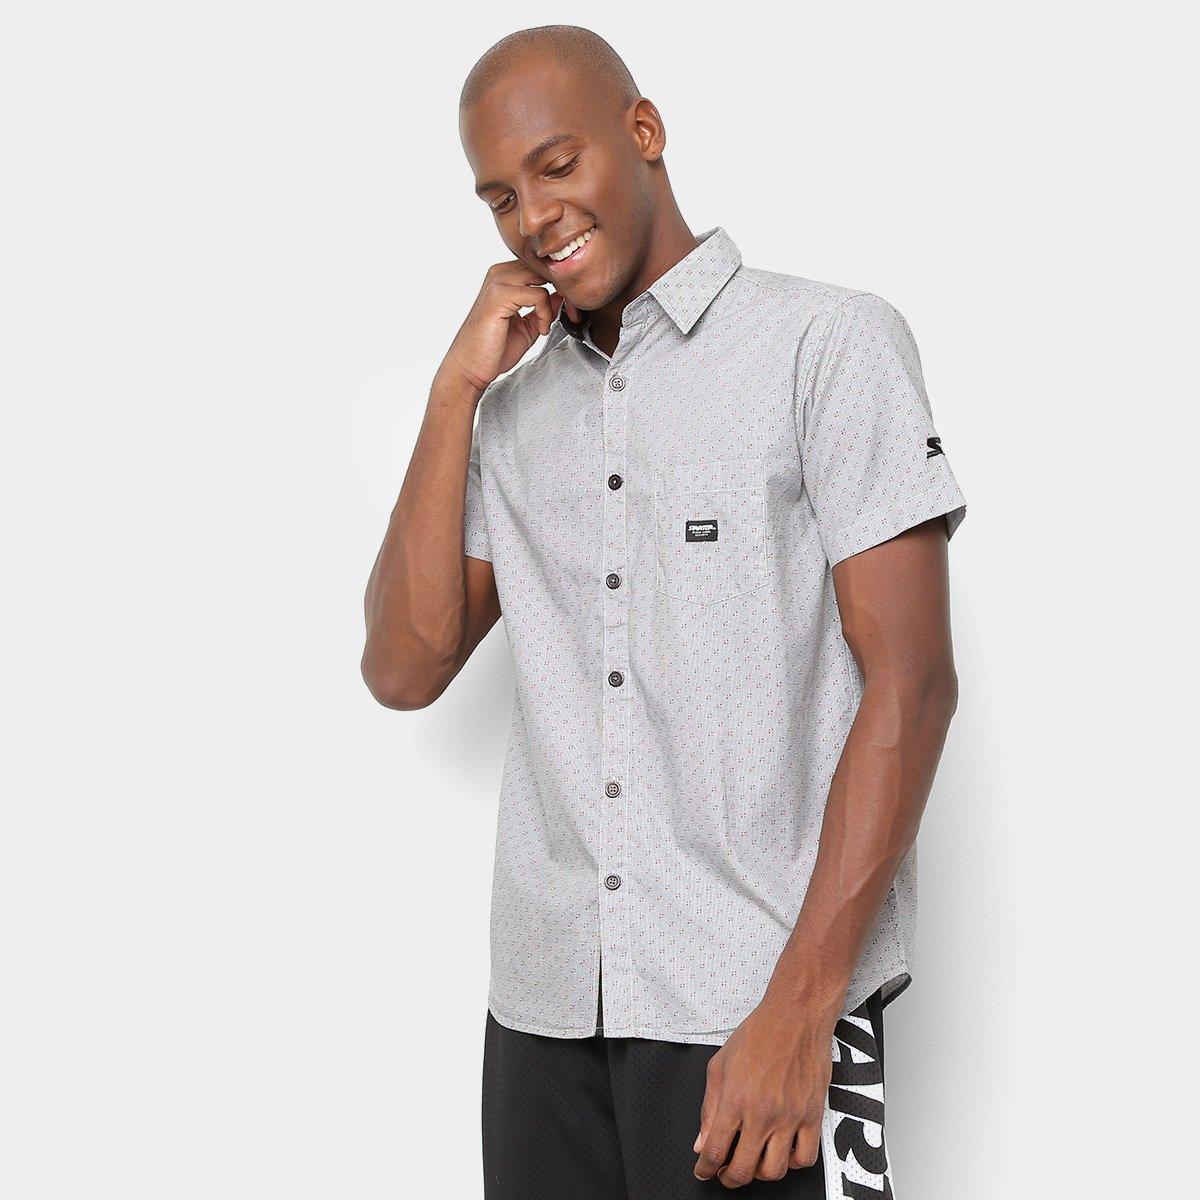 452d86cd2c0054 Camisa Manga Curta Starter Black Label Poá Masculina - Cinza ...